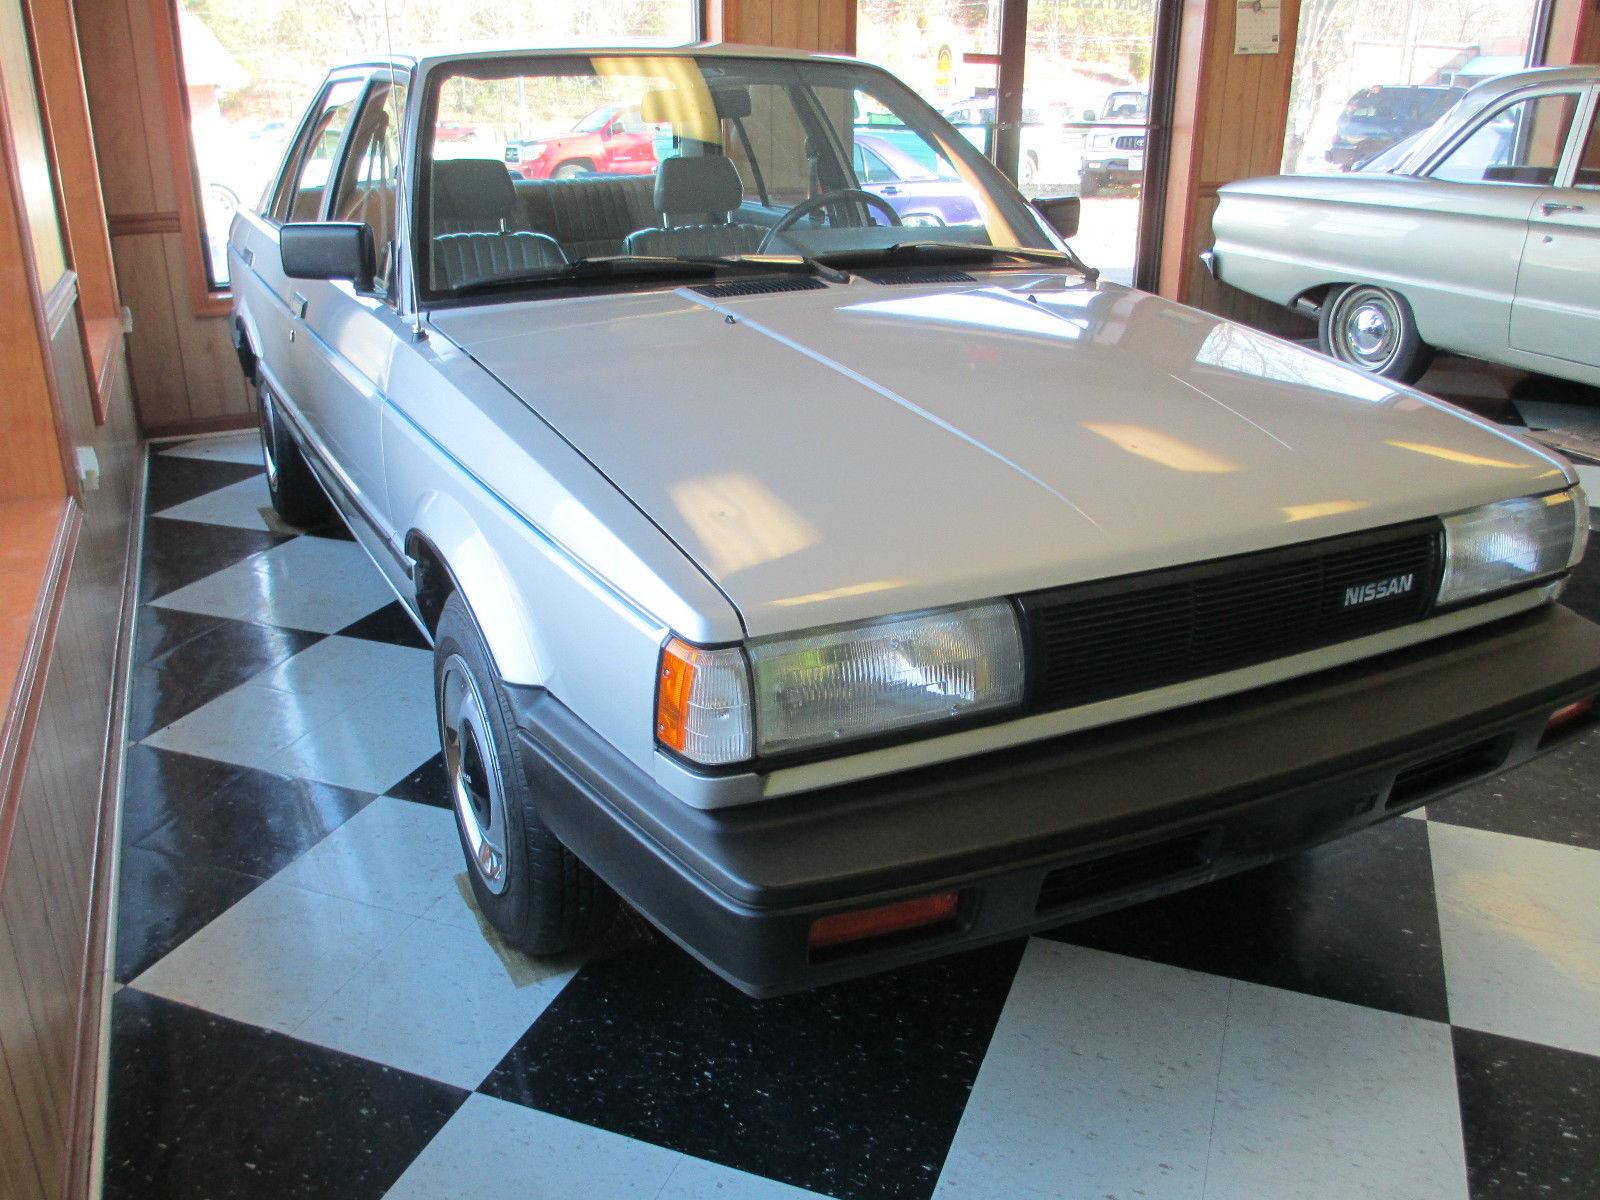 1987 Nissan Sentra E Sedan 4 Door 1 6l For Sale In Prince